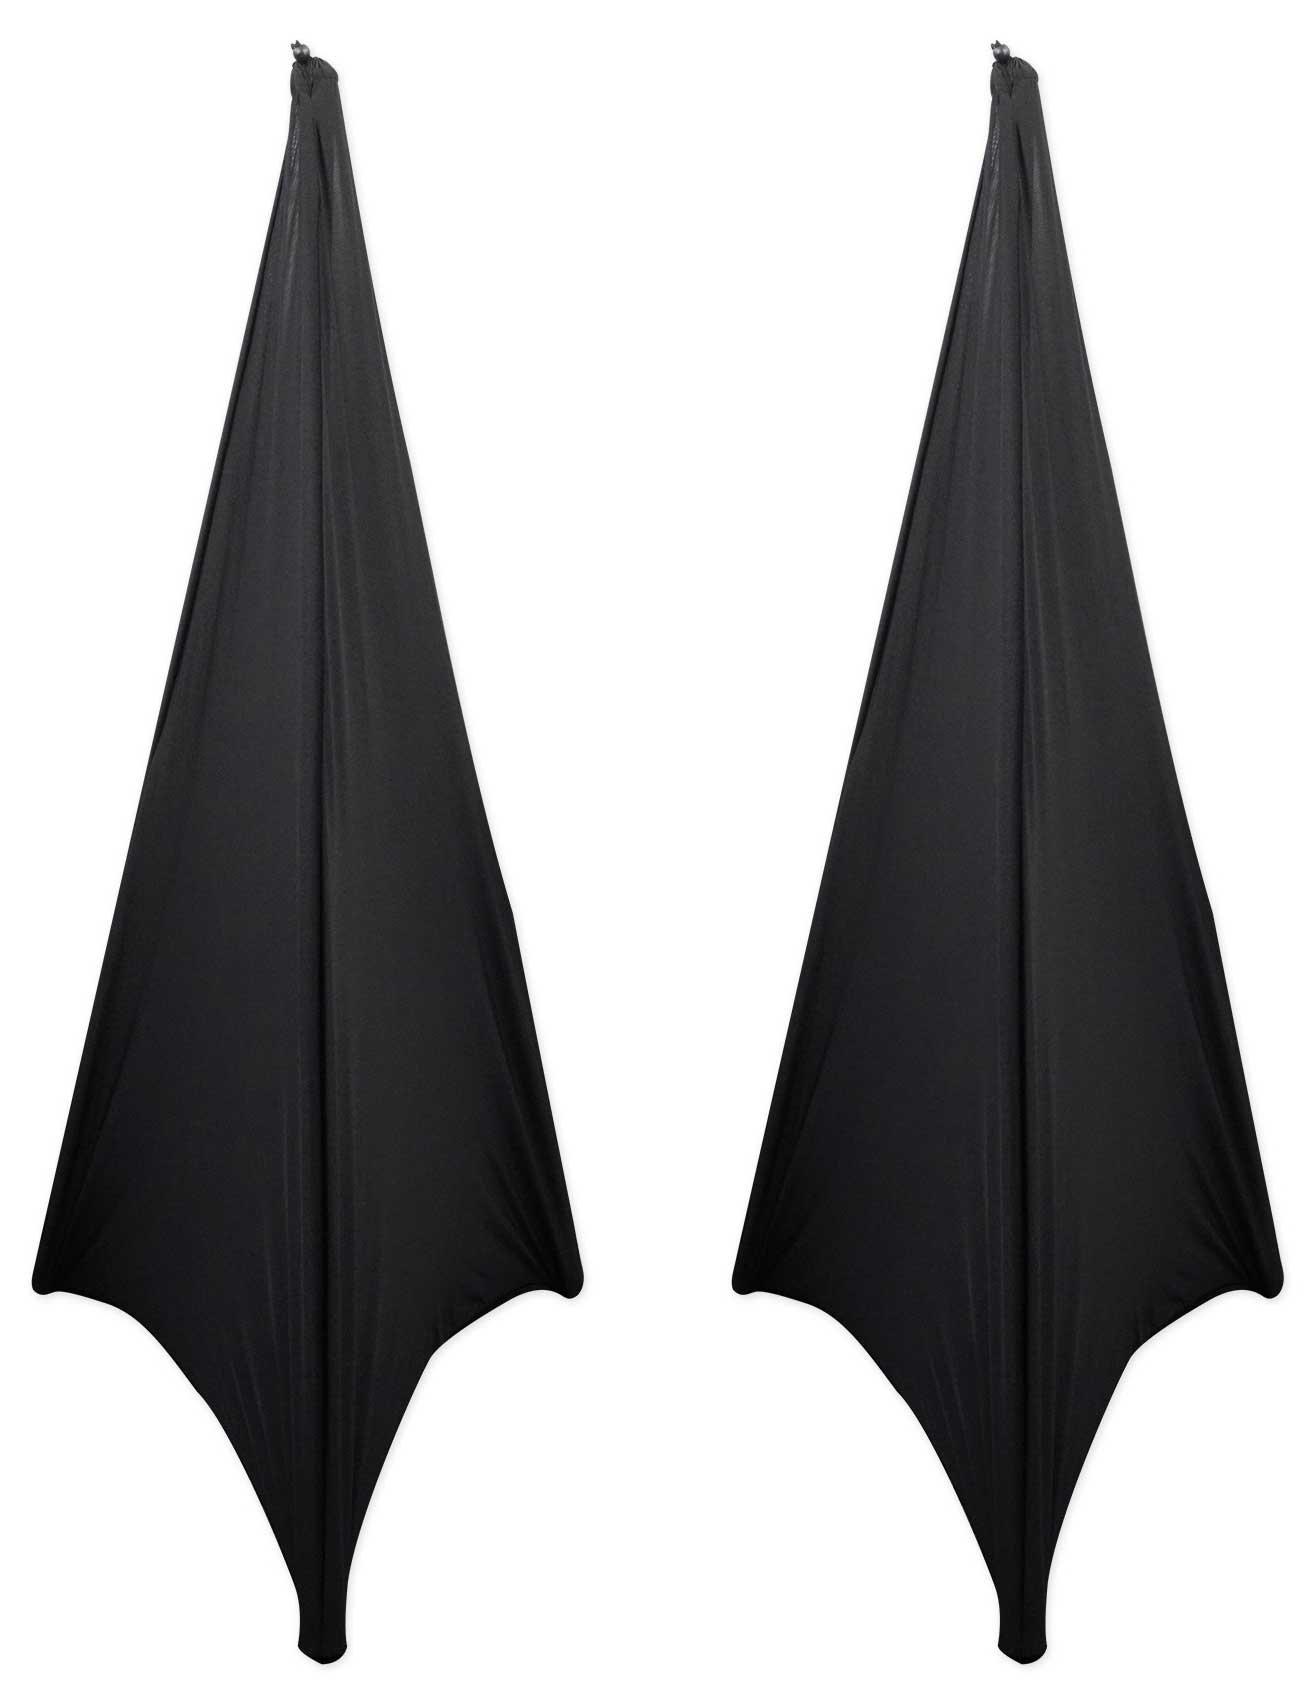 (2) Rockville RSC7B Black Tripod PA Speaker Stand Scrims Cloth 360 Degree Cover